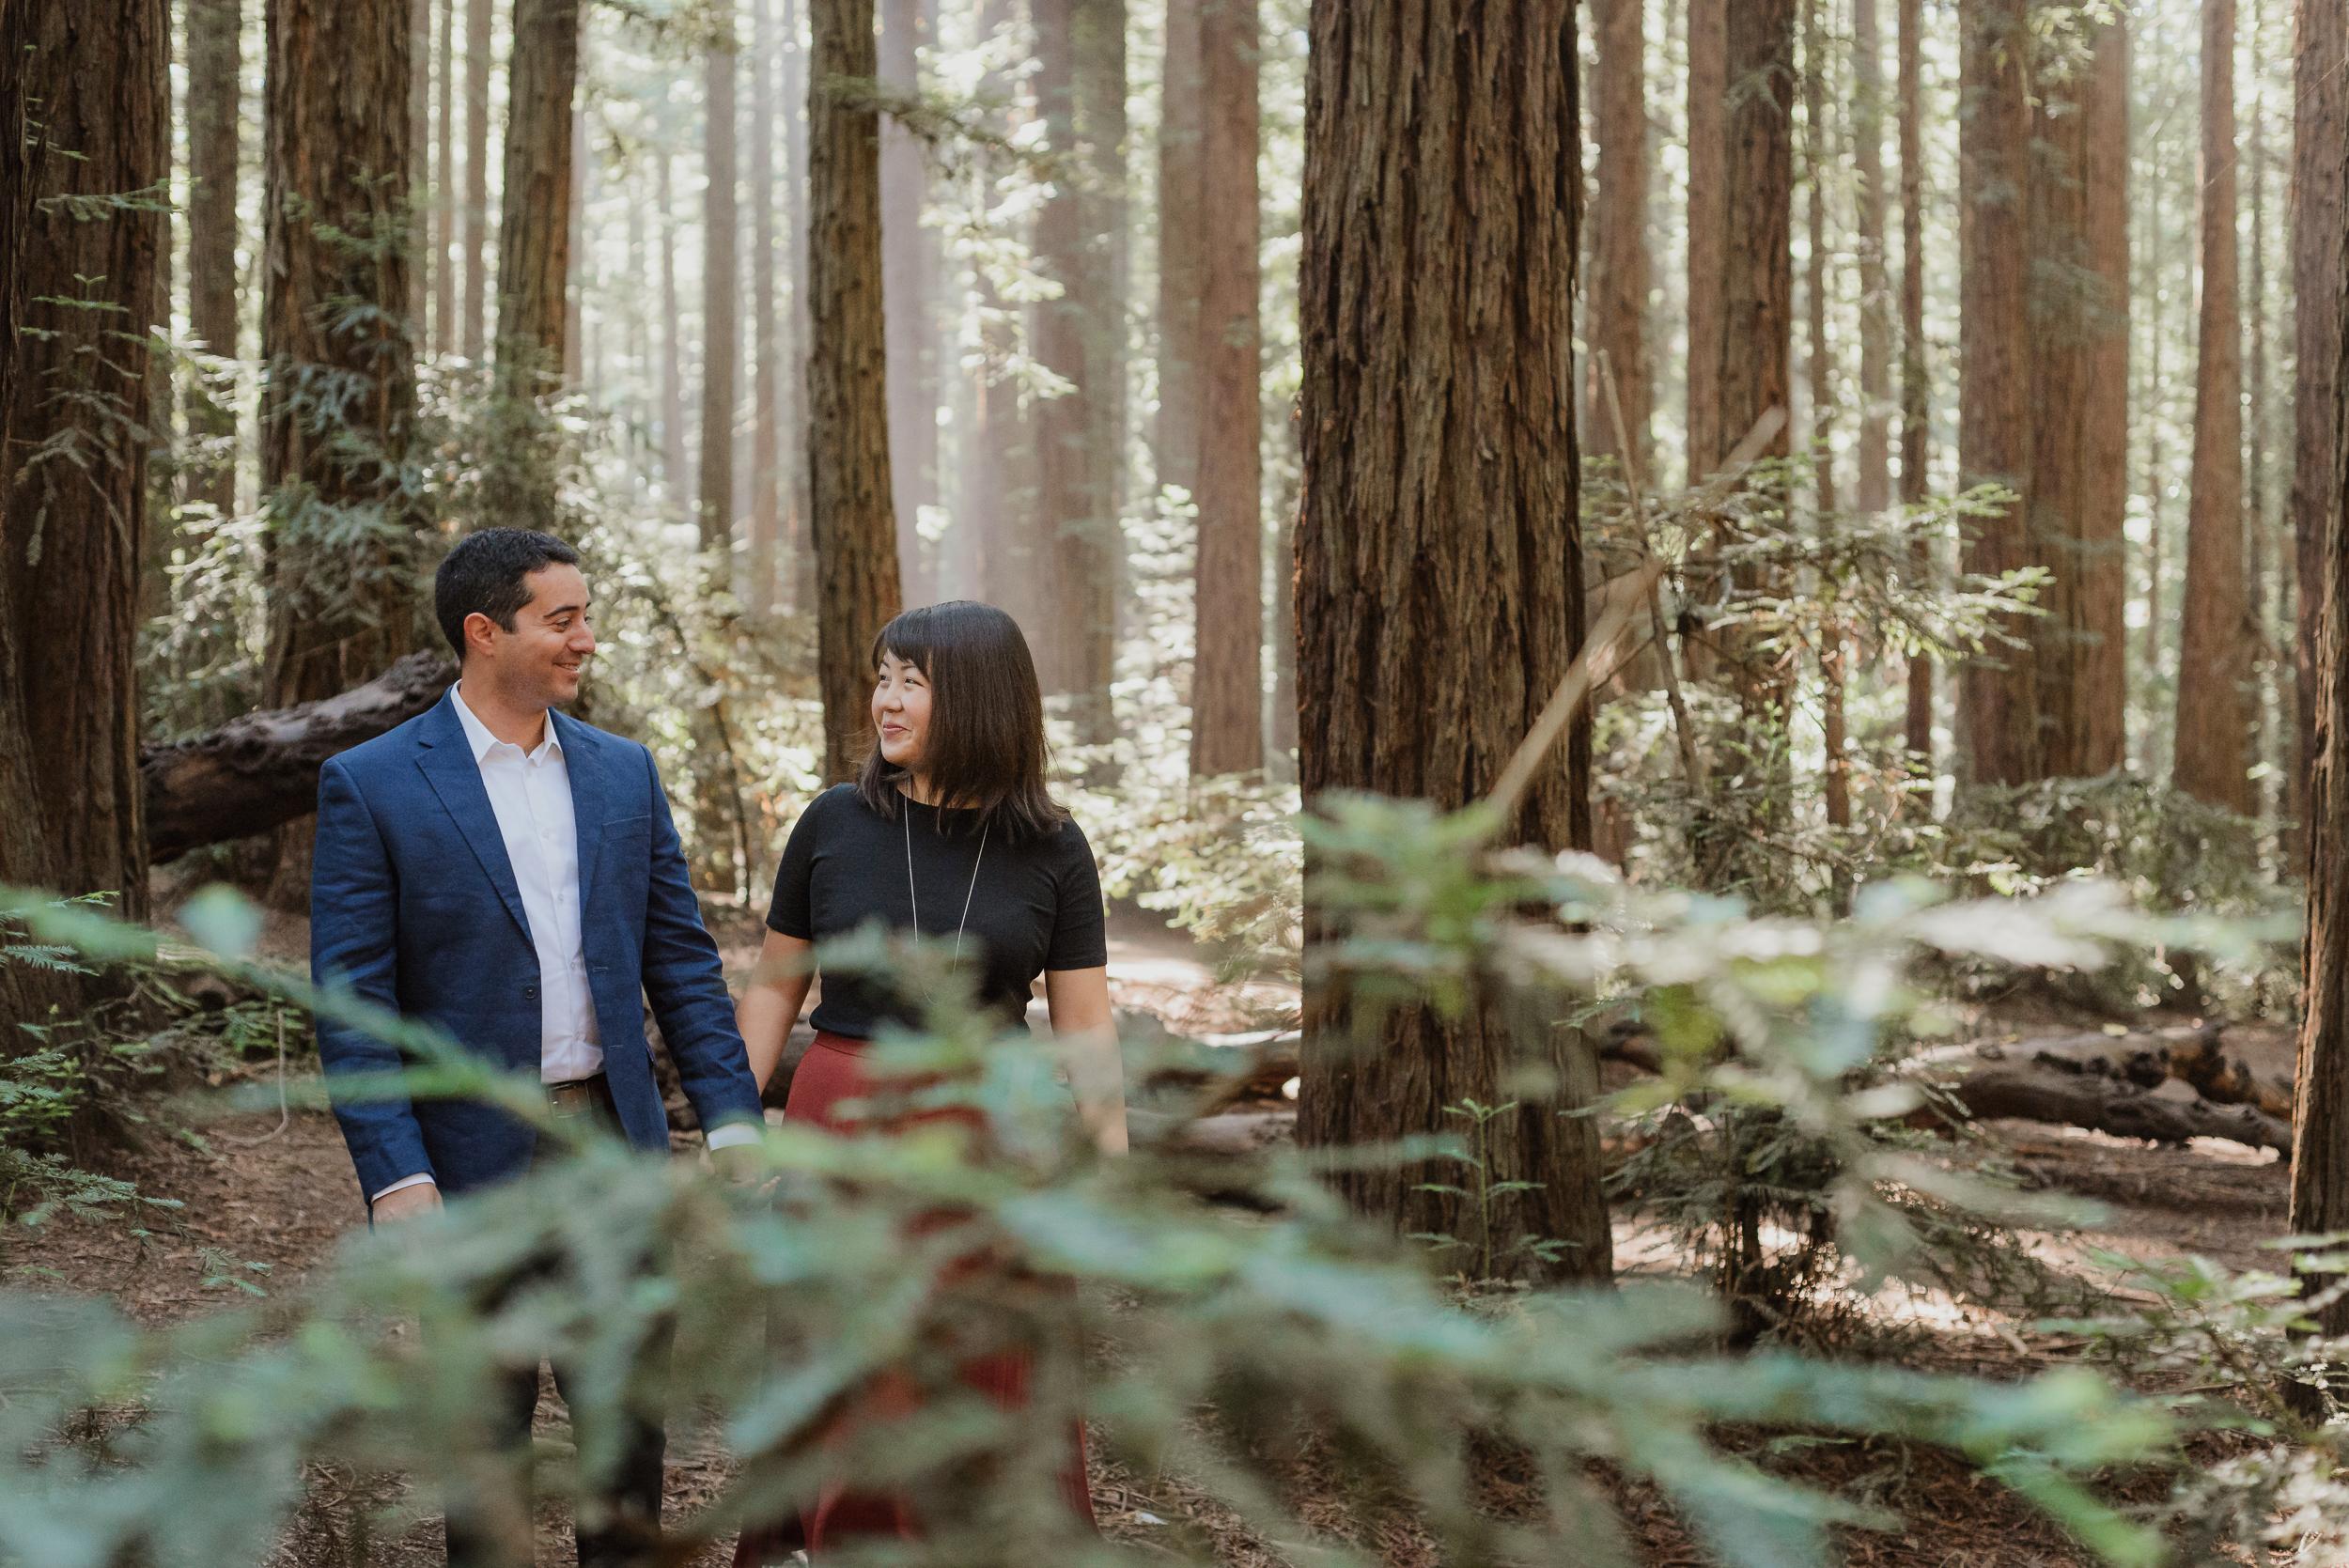 oakland-redwood-engagement-session-photographer-vivianchen-054.jpg